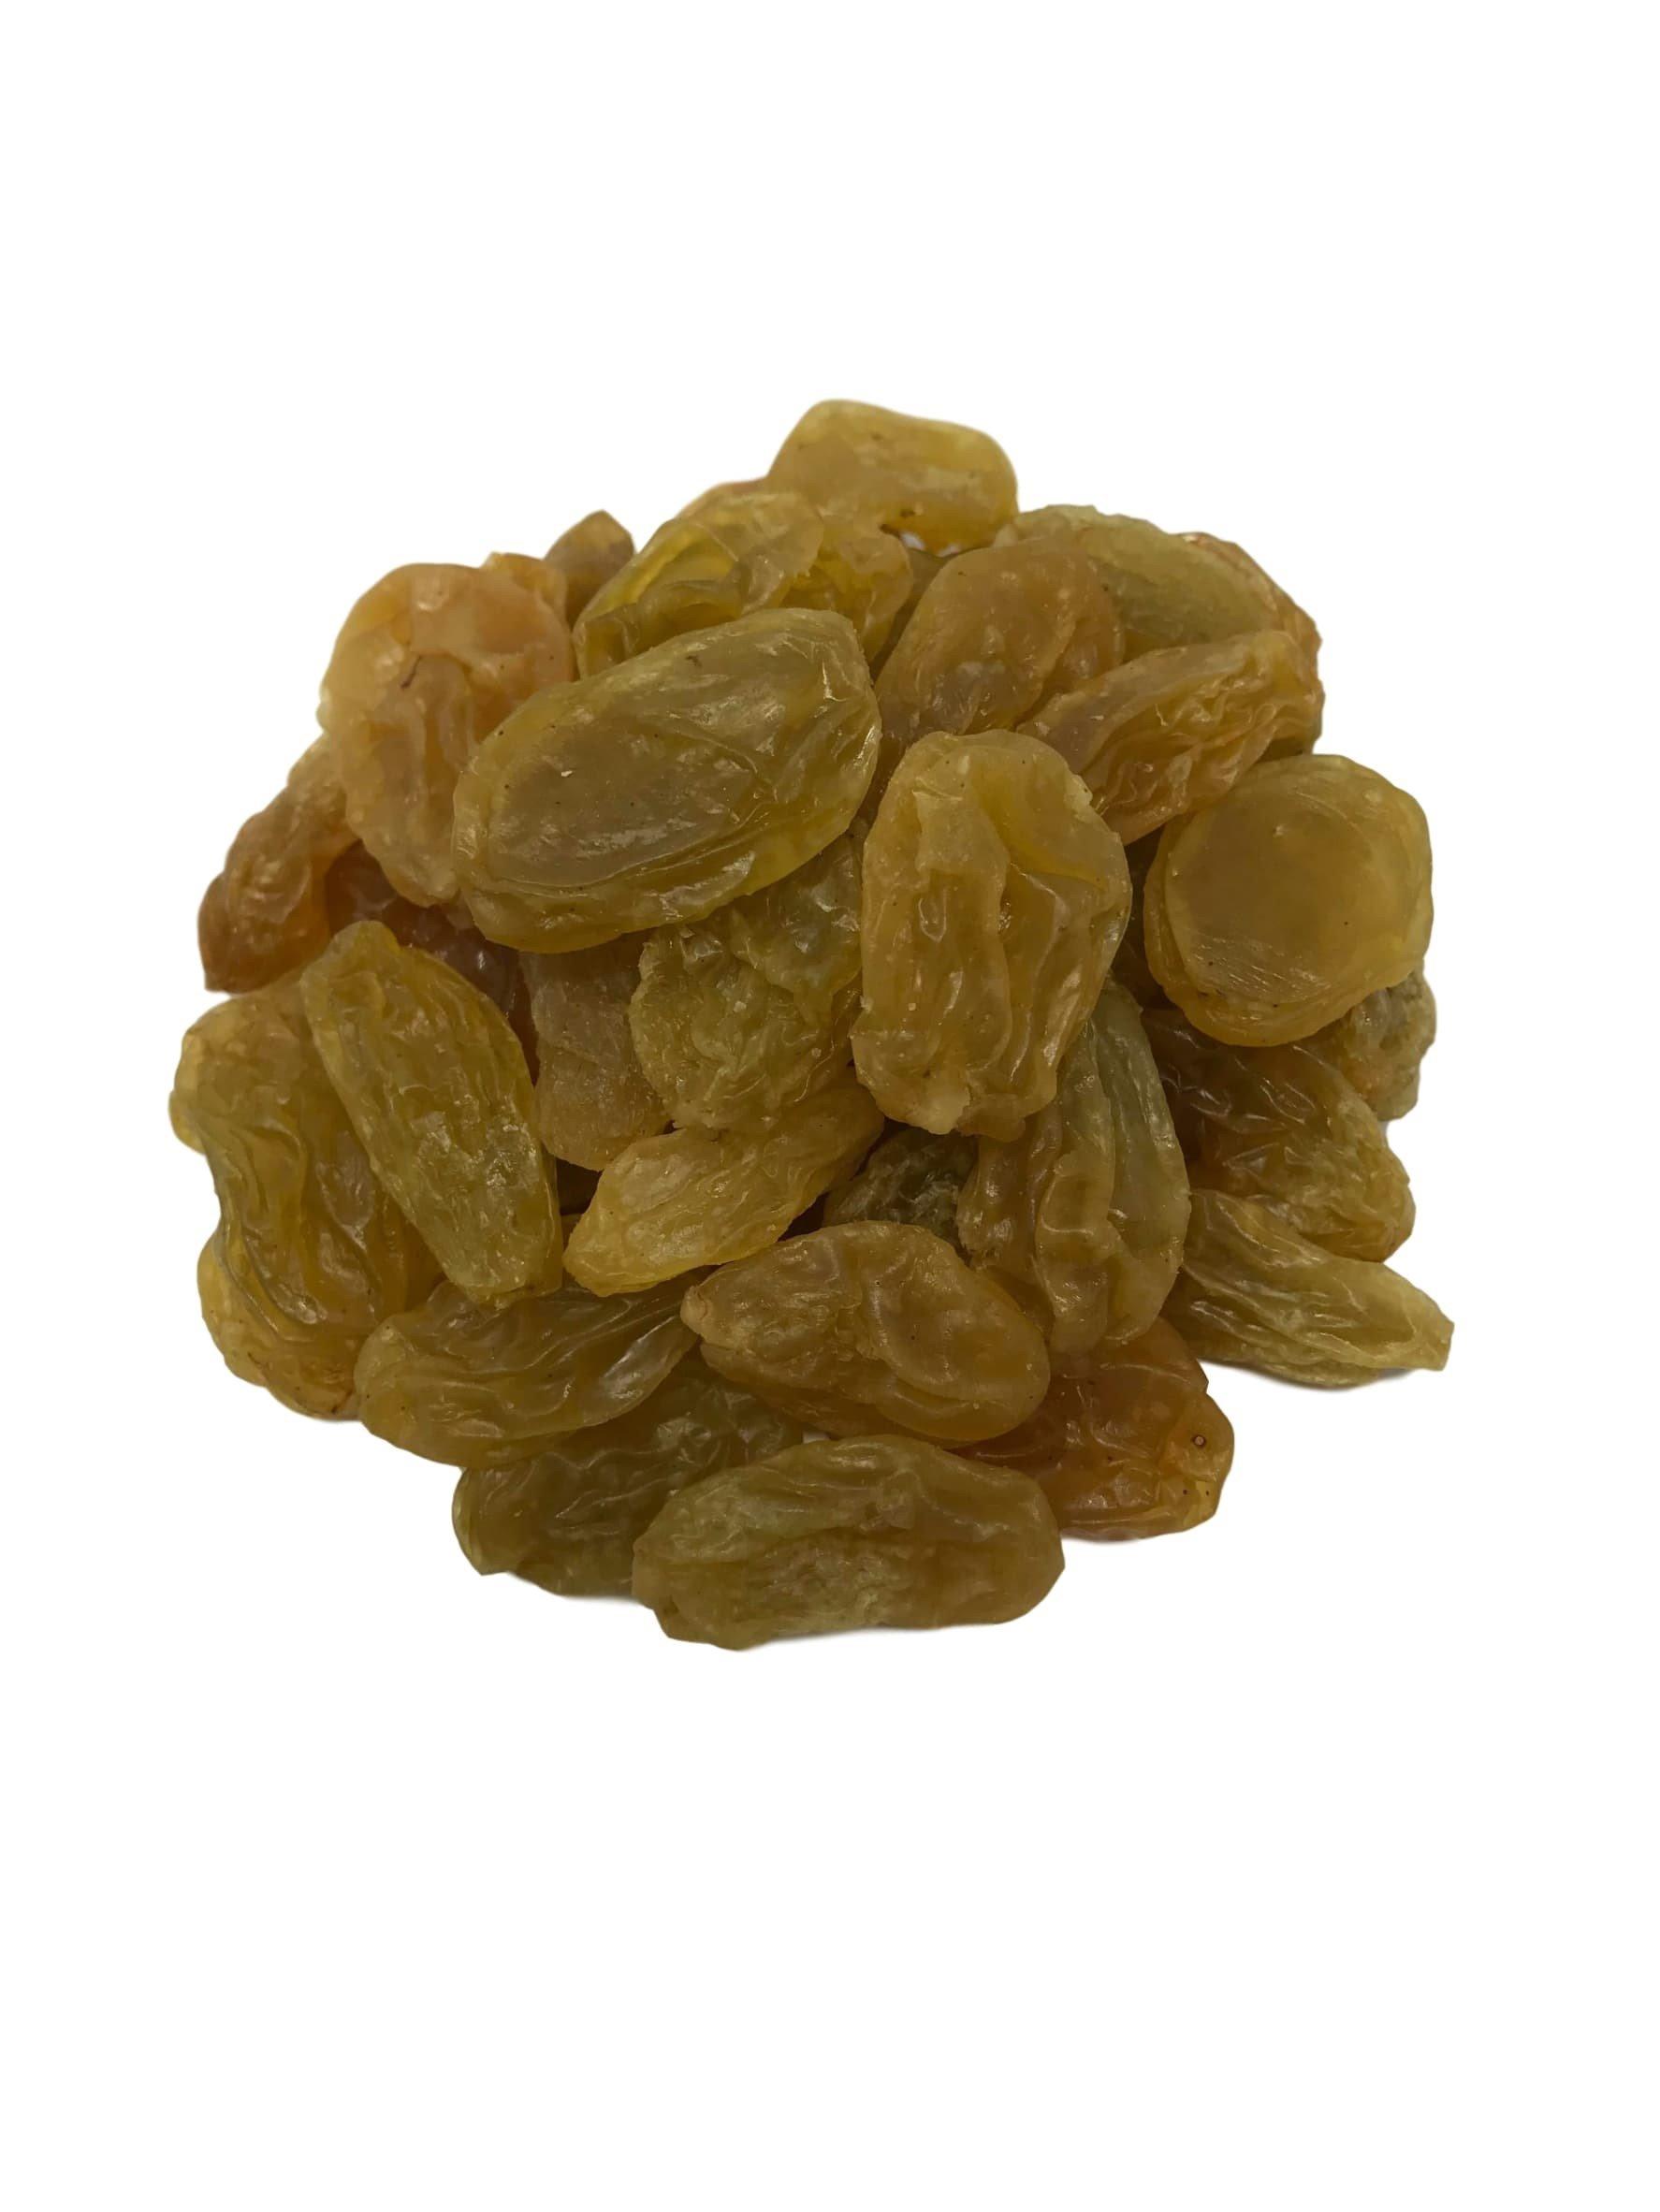 NUTS U.S. - Golden California Raisins, JUMBO!!! (4 LBS) by NUTS - U.S. - HEALTH IN EVERY BITE !